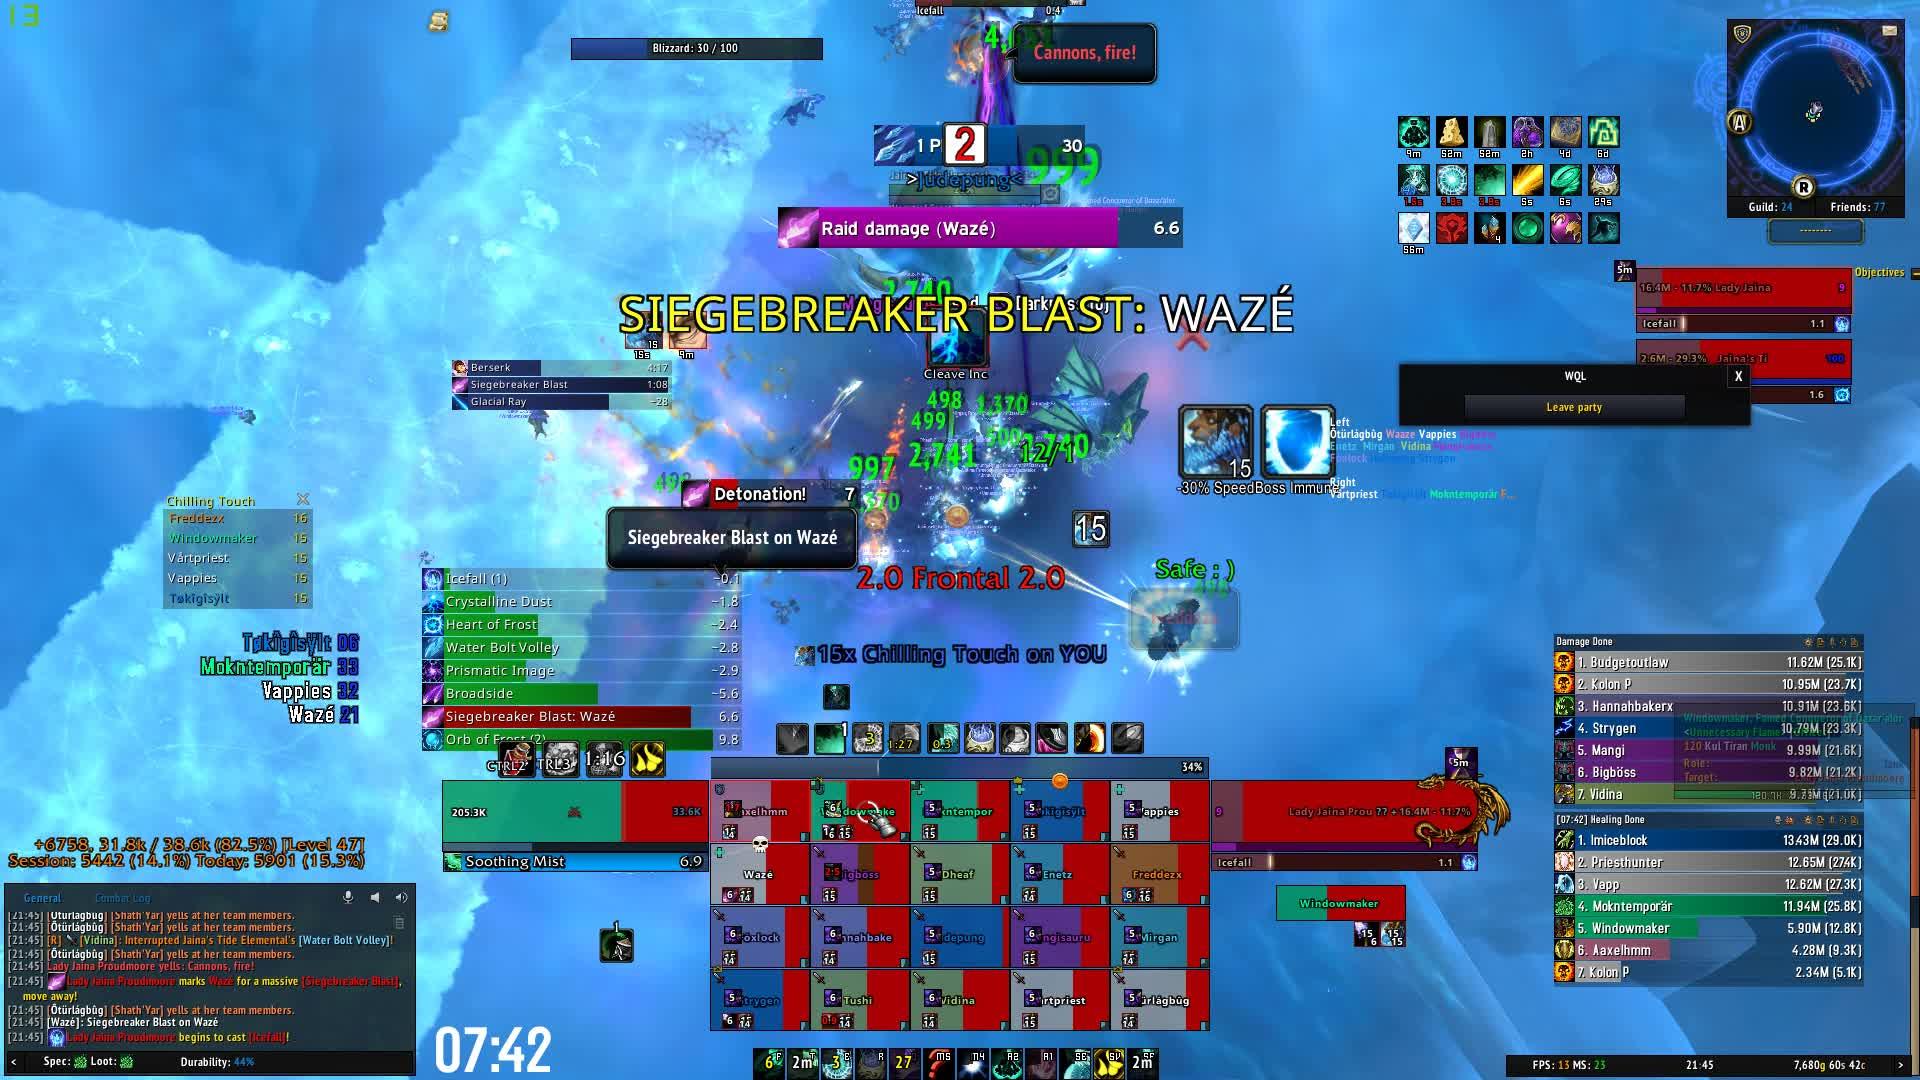 worldofwarcraft, World Of Warcraft 2019.04.11 - 21.46.05.10.DVR GIFs